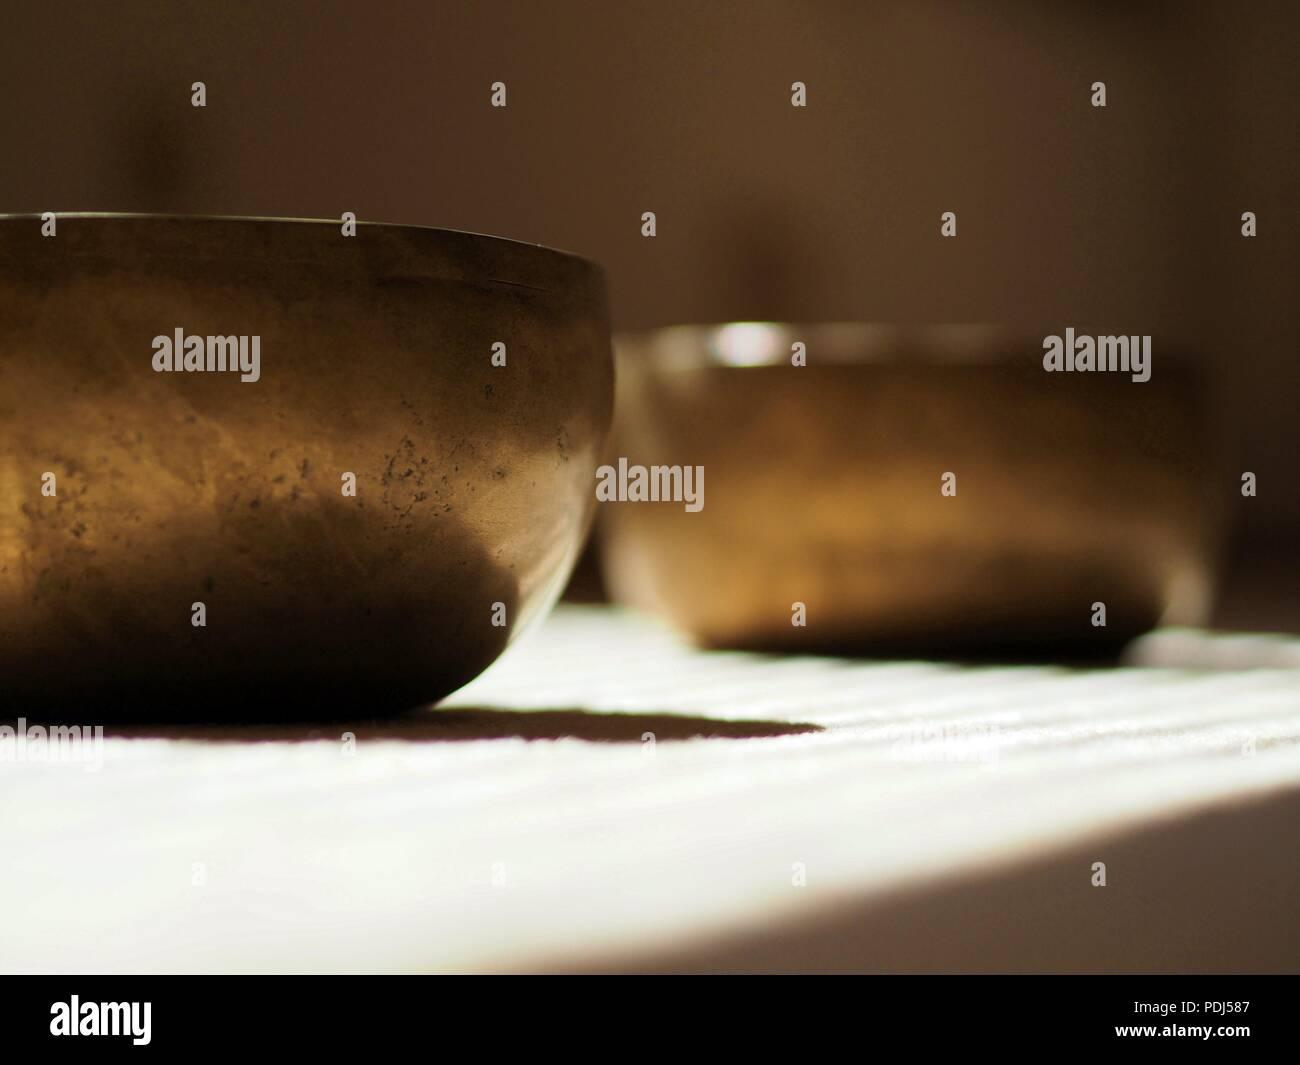 Singing bowls, close up, for mediatation or sound massage - Stock Image